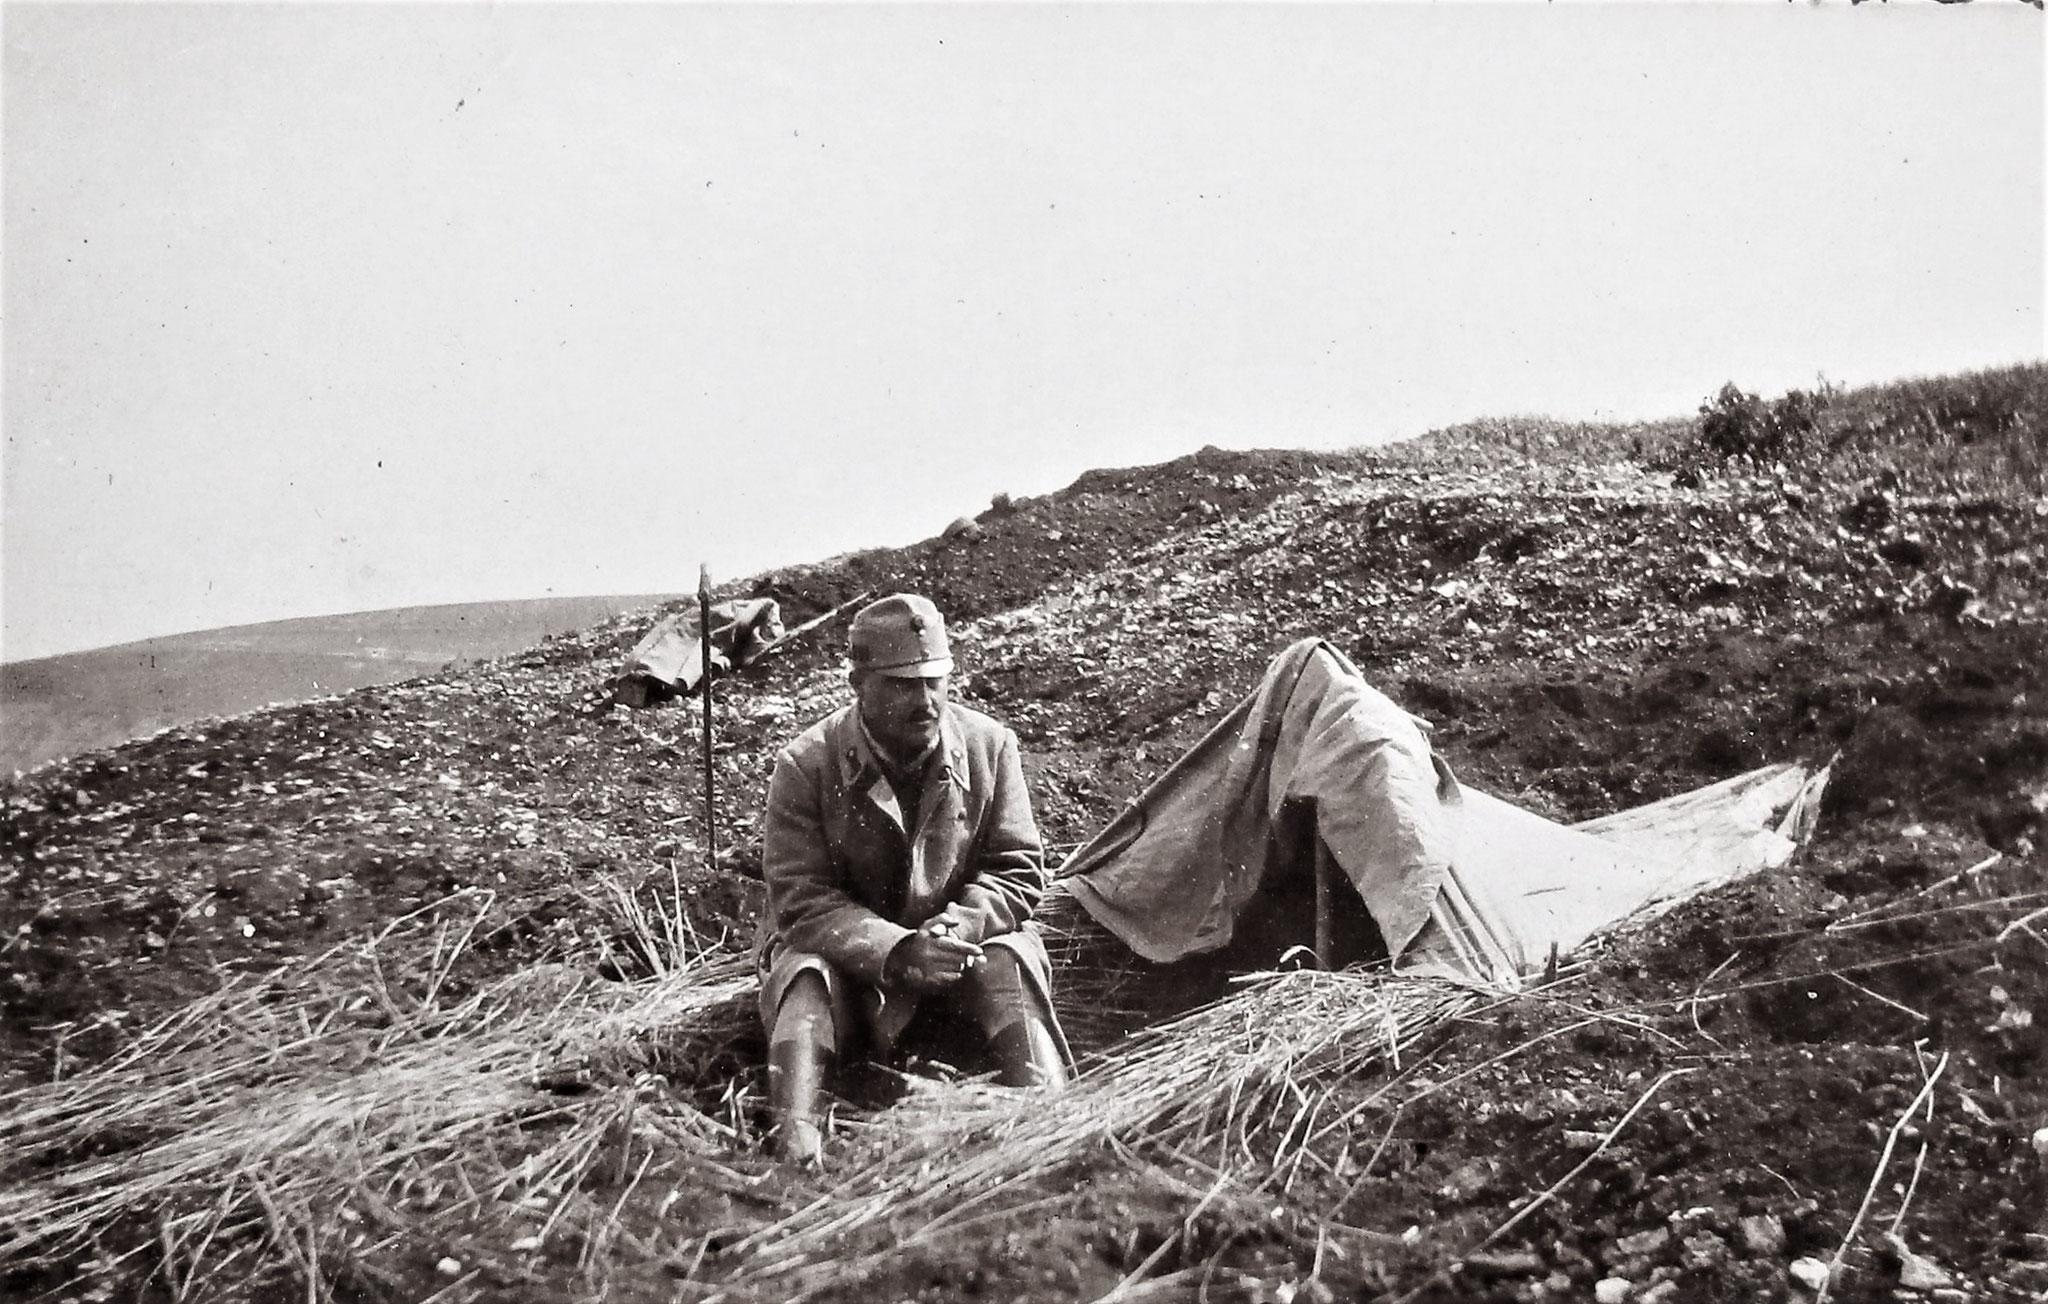 Offzstellv. Franz Werther (1. Esk), Kmdt des 2. Zugs der Fuß-Esk. DR. 5, Harasymow am Dnjestr, Ende Juni 1916.